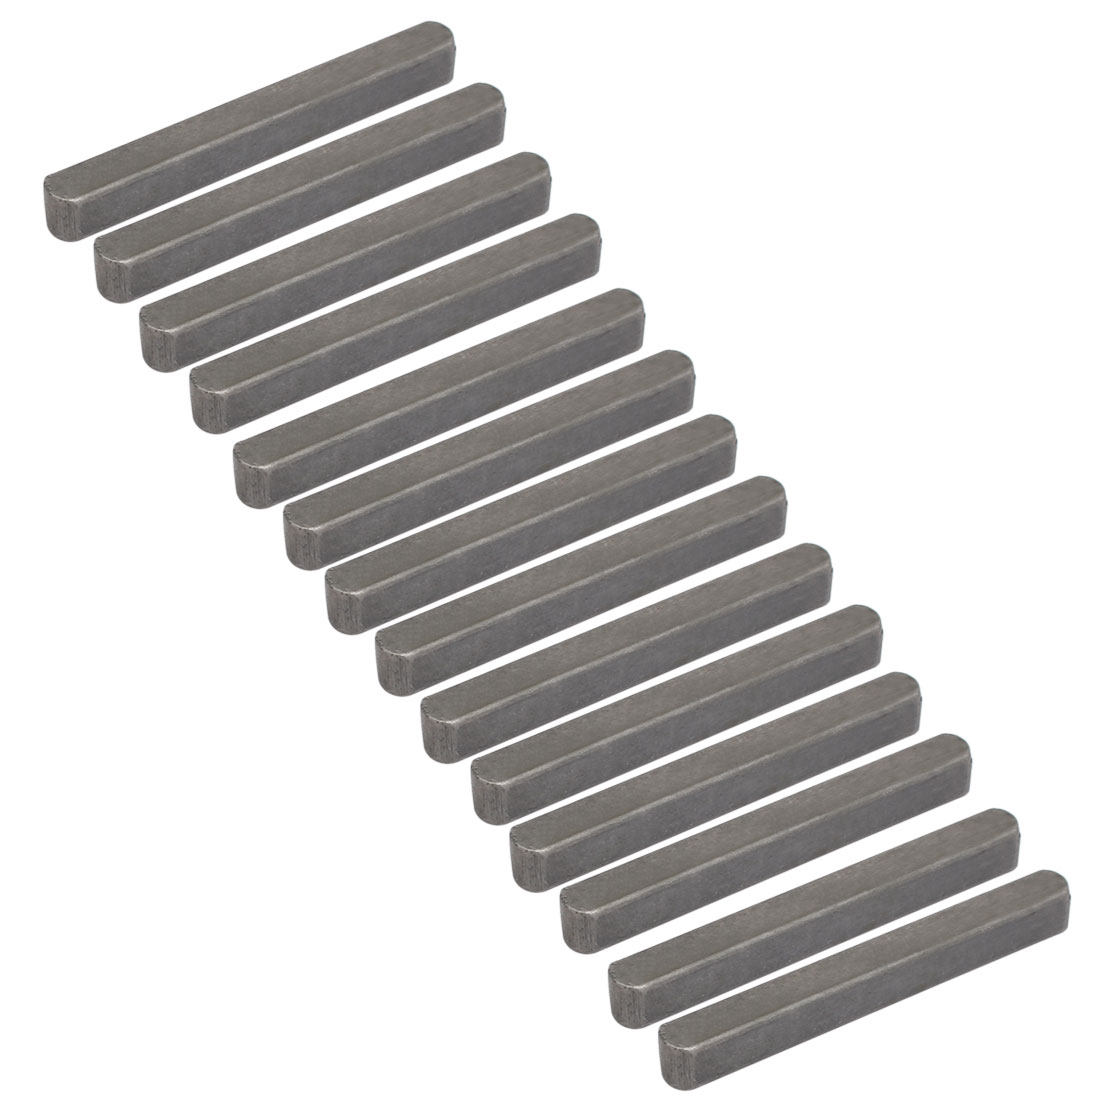 55mmx6mmx6mm Carbon Steel Key Stock To Lock Pulleys 14pcs